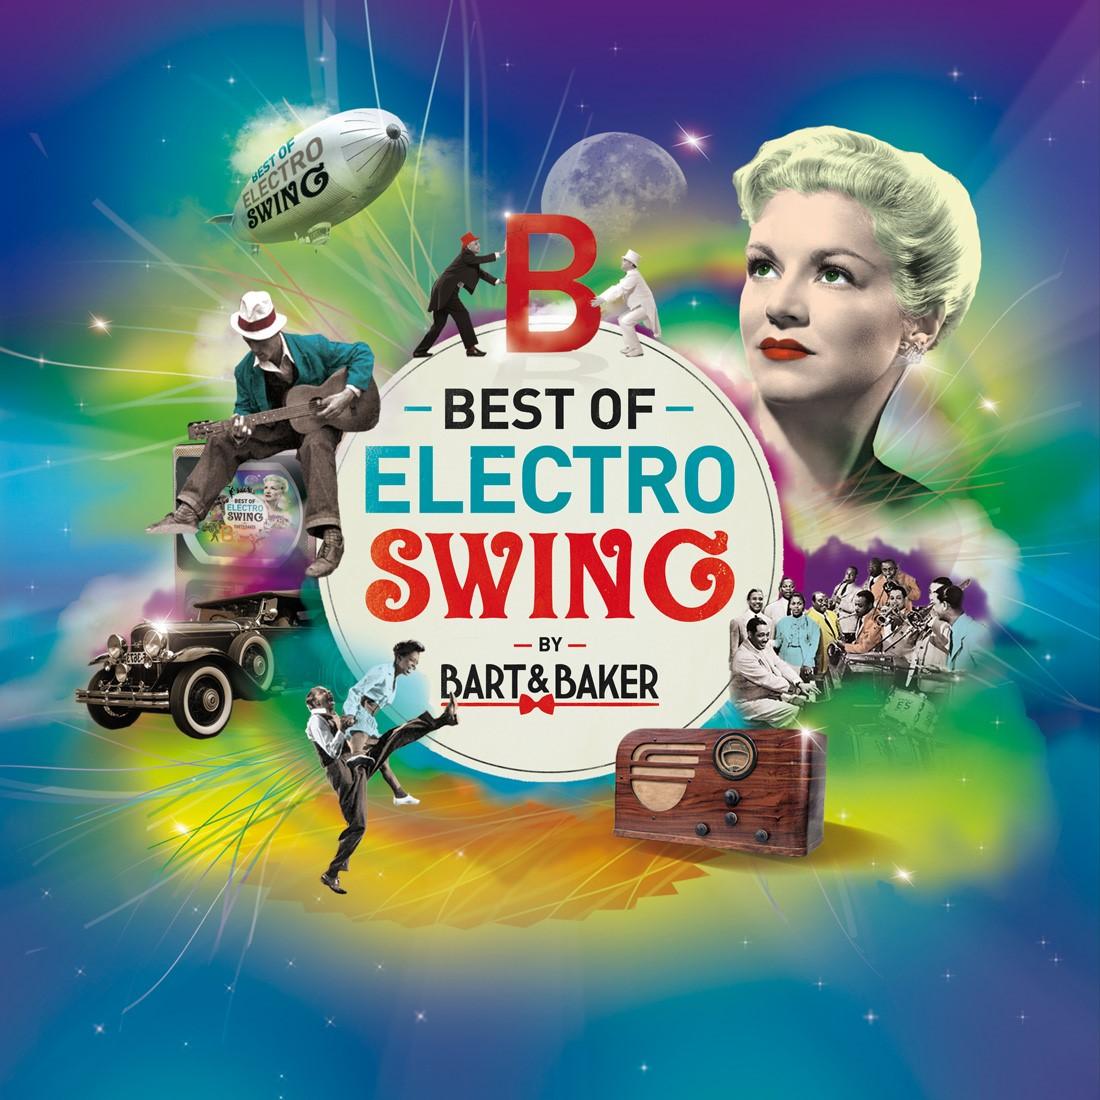 visuel-def-best-of-electro-swing